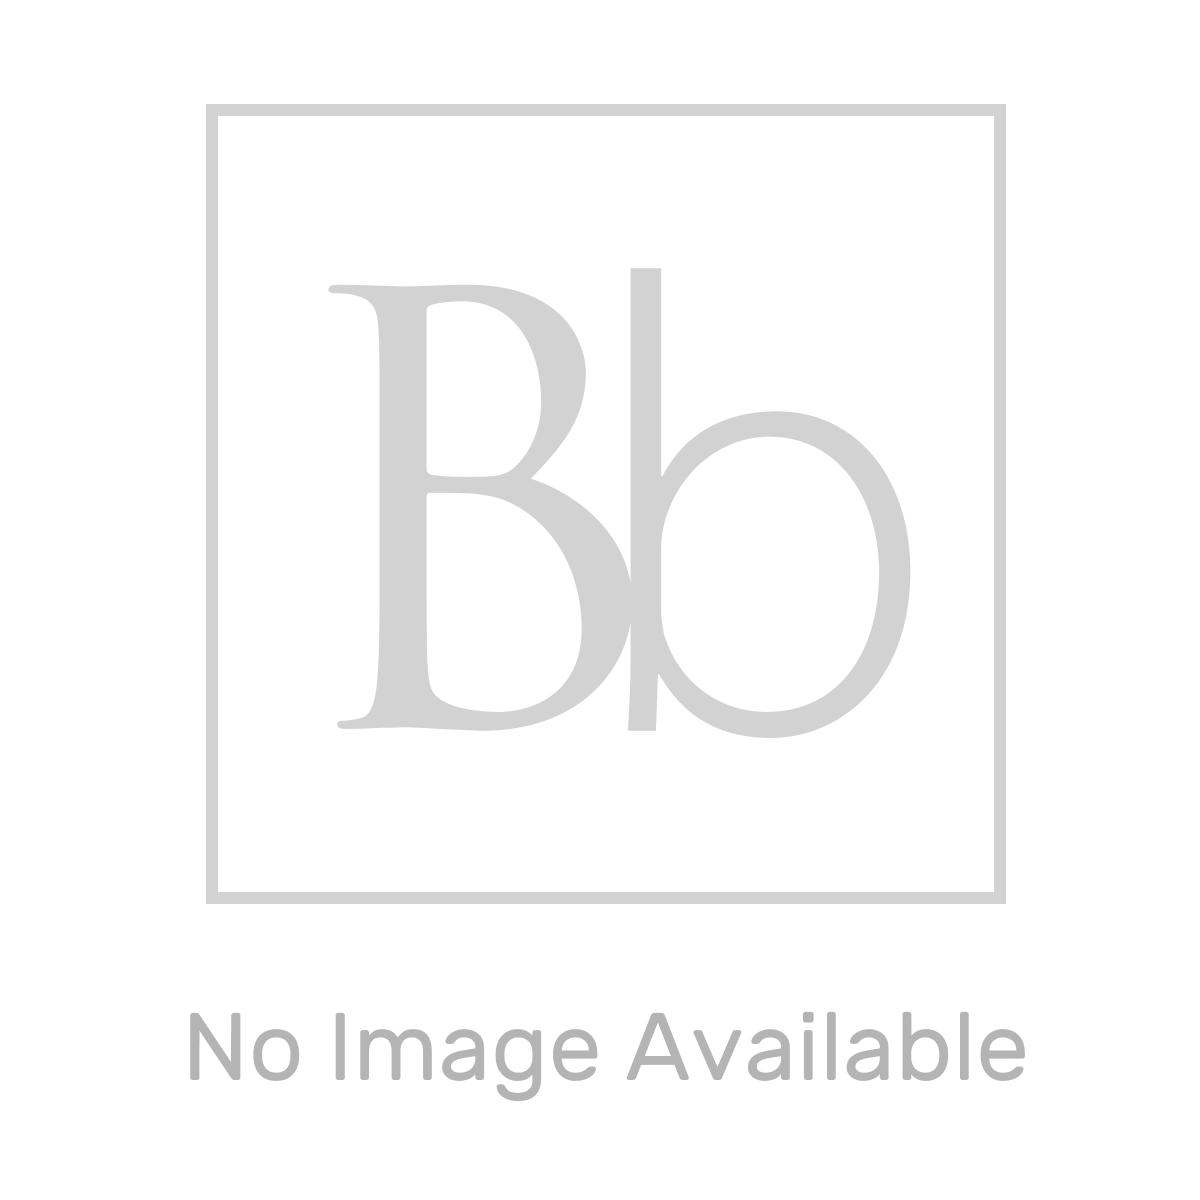 Nuie Athena Natural Oak 2 Door Floor Standing Vanity Unit with 18mm Profile Basin 600mm Line Drawing